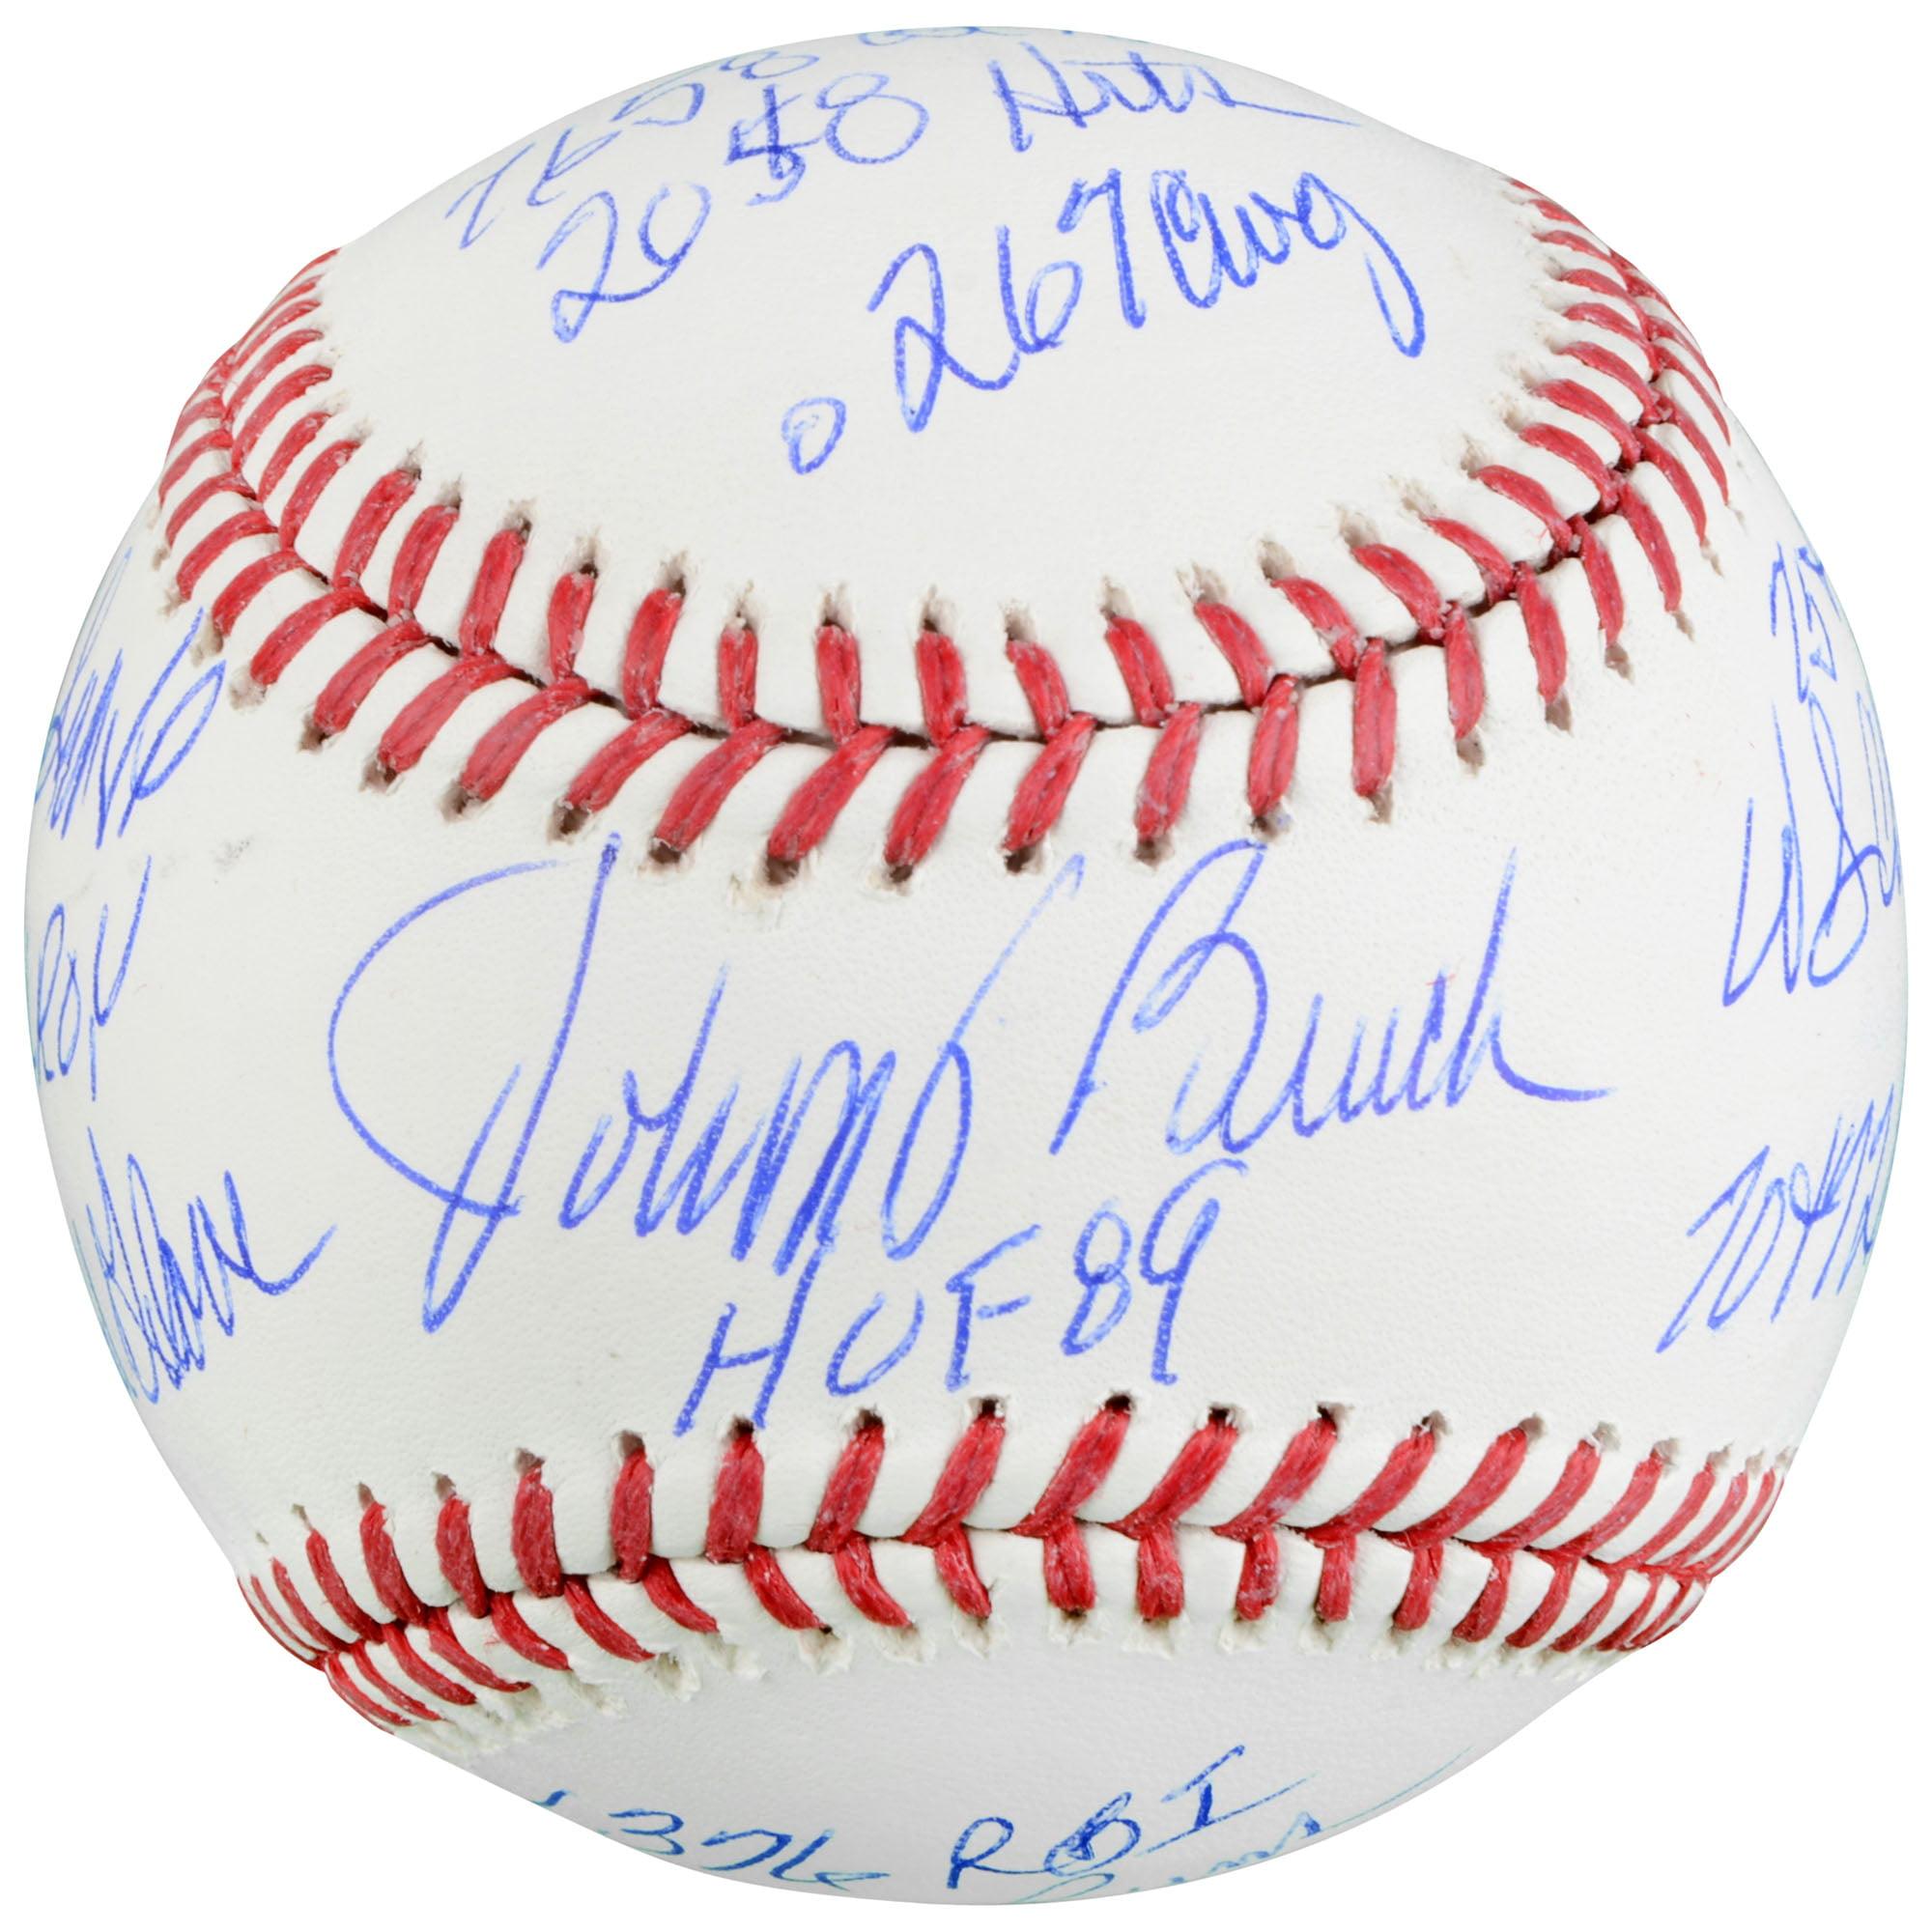 Autographed Baseballs Fanatics Authentic Certified Johnny Bench Cincinnati Reds Autographed Autographed Baseball